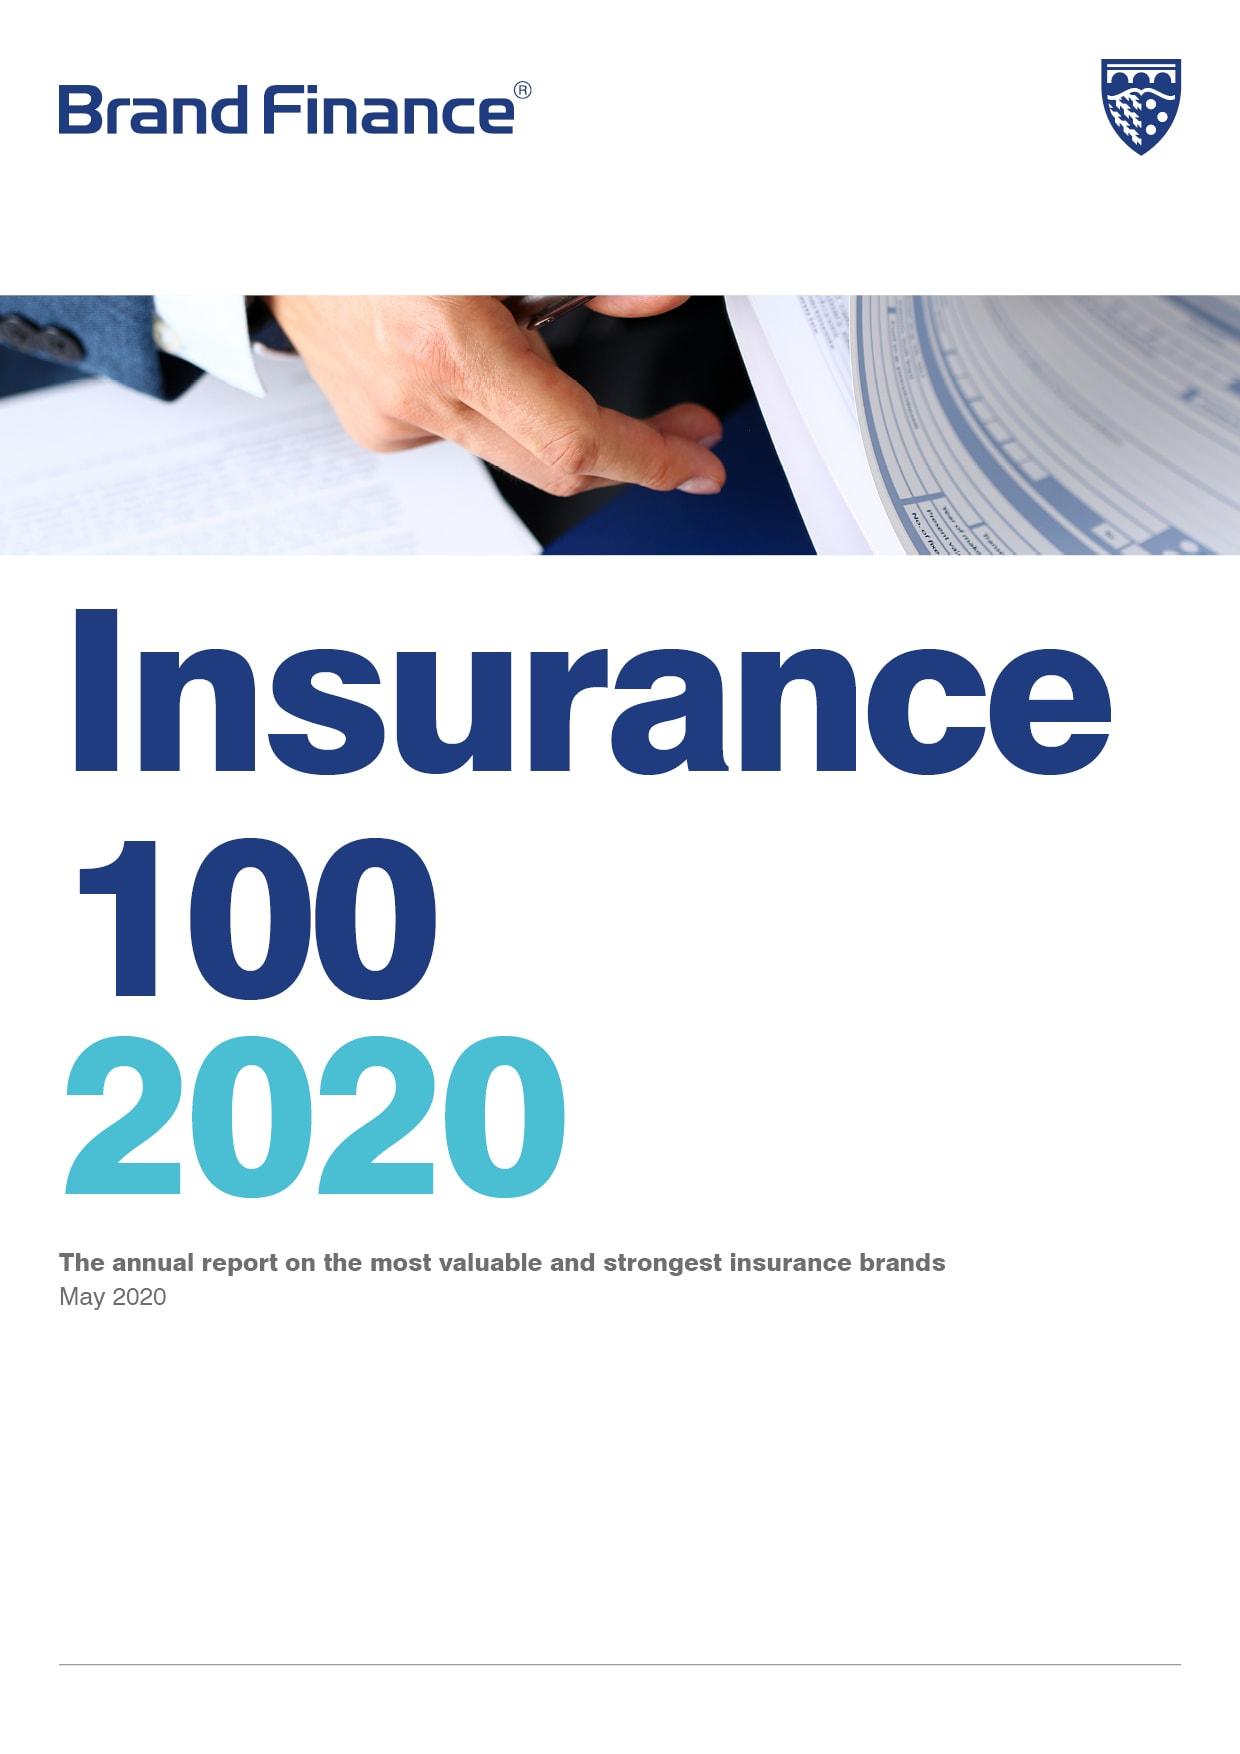 Brand Finance Insurance 100 2020